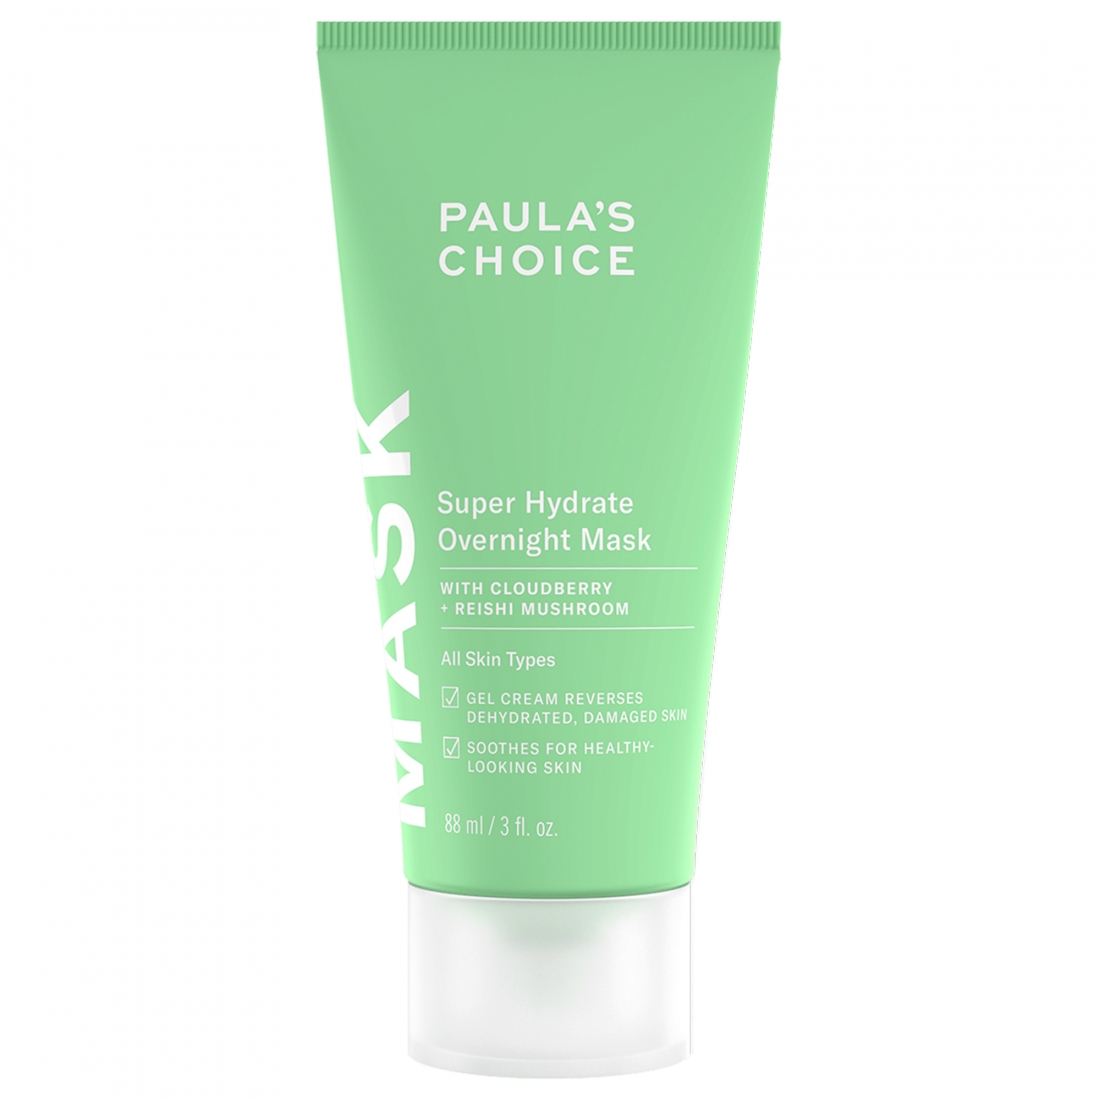 7_mat na duong da_paulas choice super hydrate overnight mask_elle man_0420